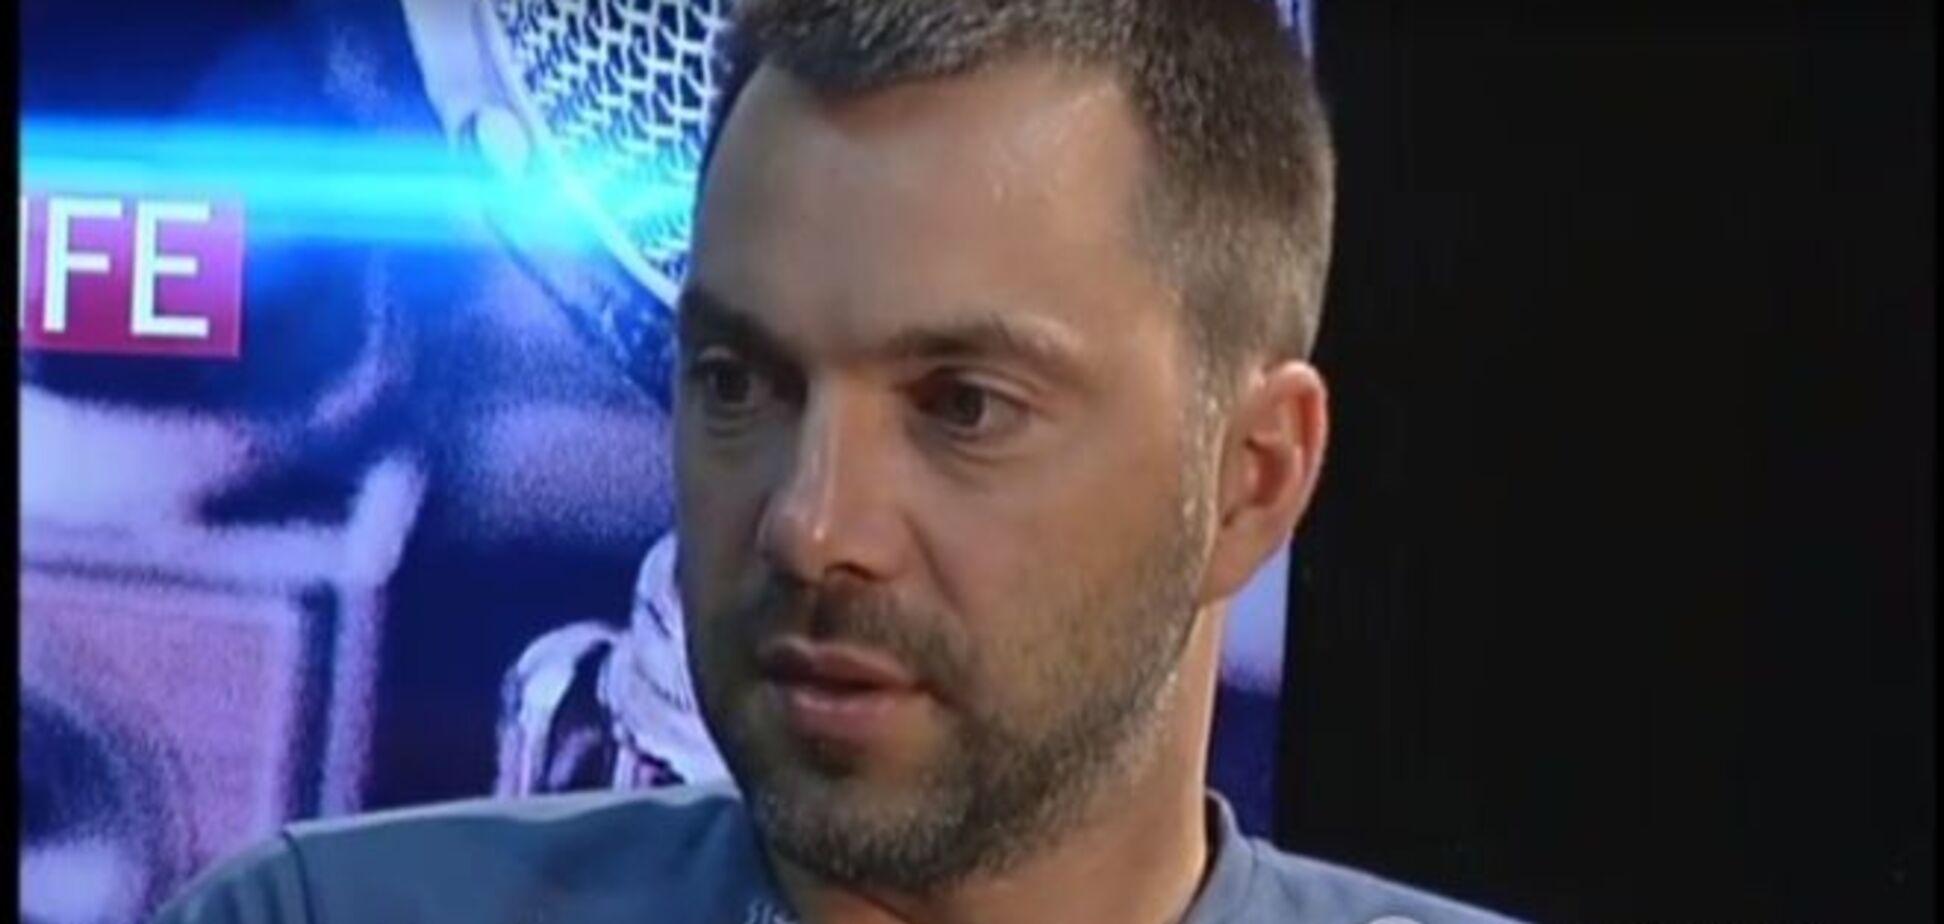 Арестович пояснив, чому Москаль став губернатором Закарпаття